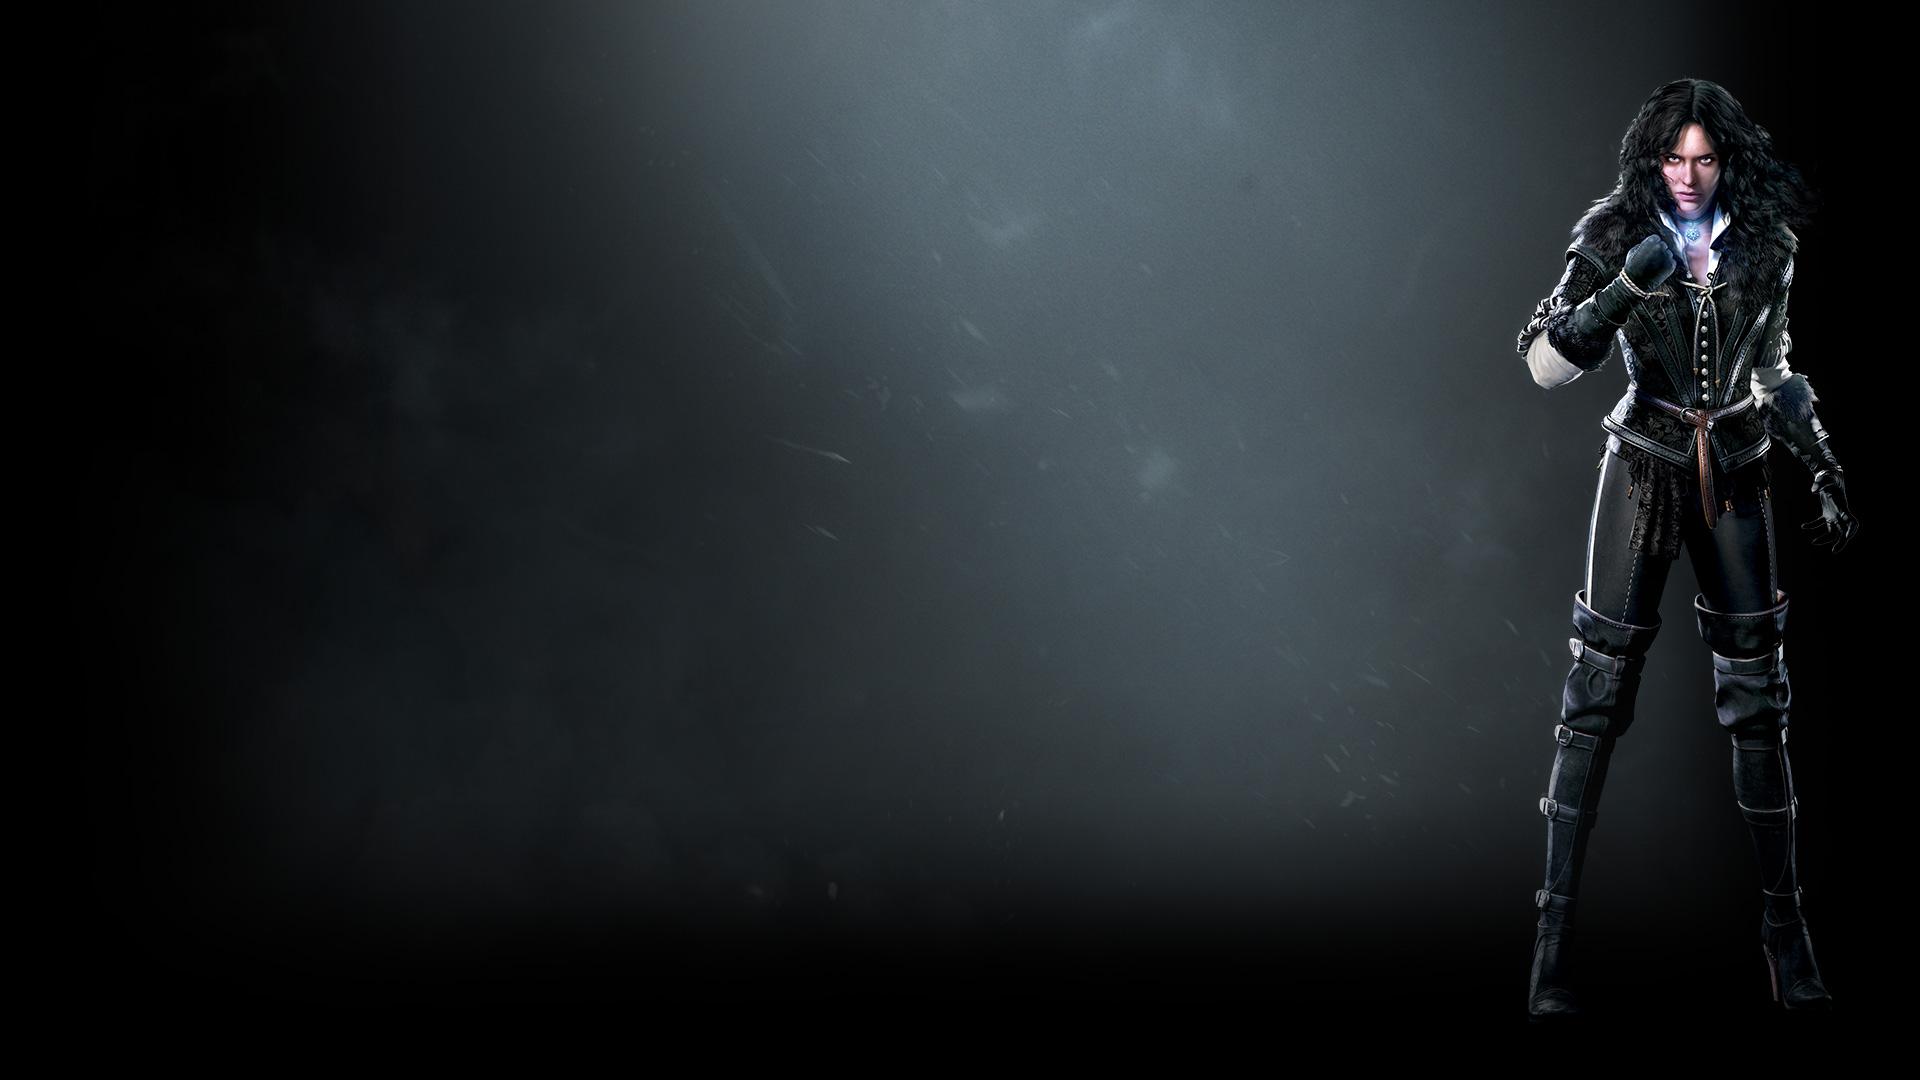 Steam Community Market Listings For 292030 Yennefer Profile